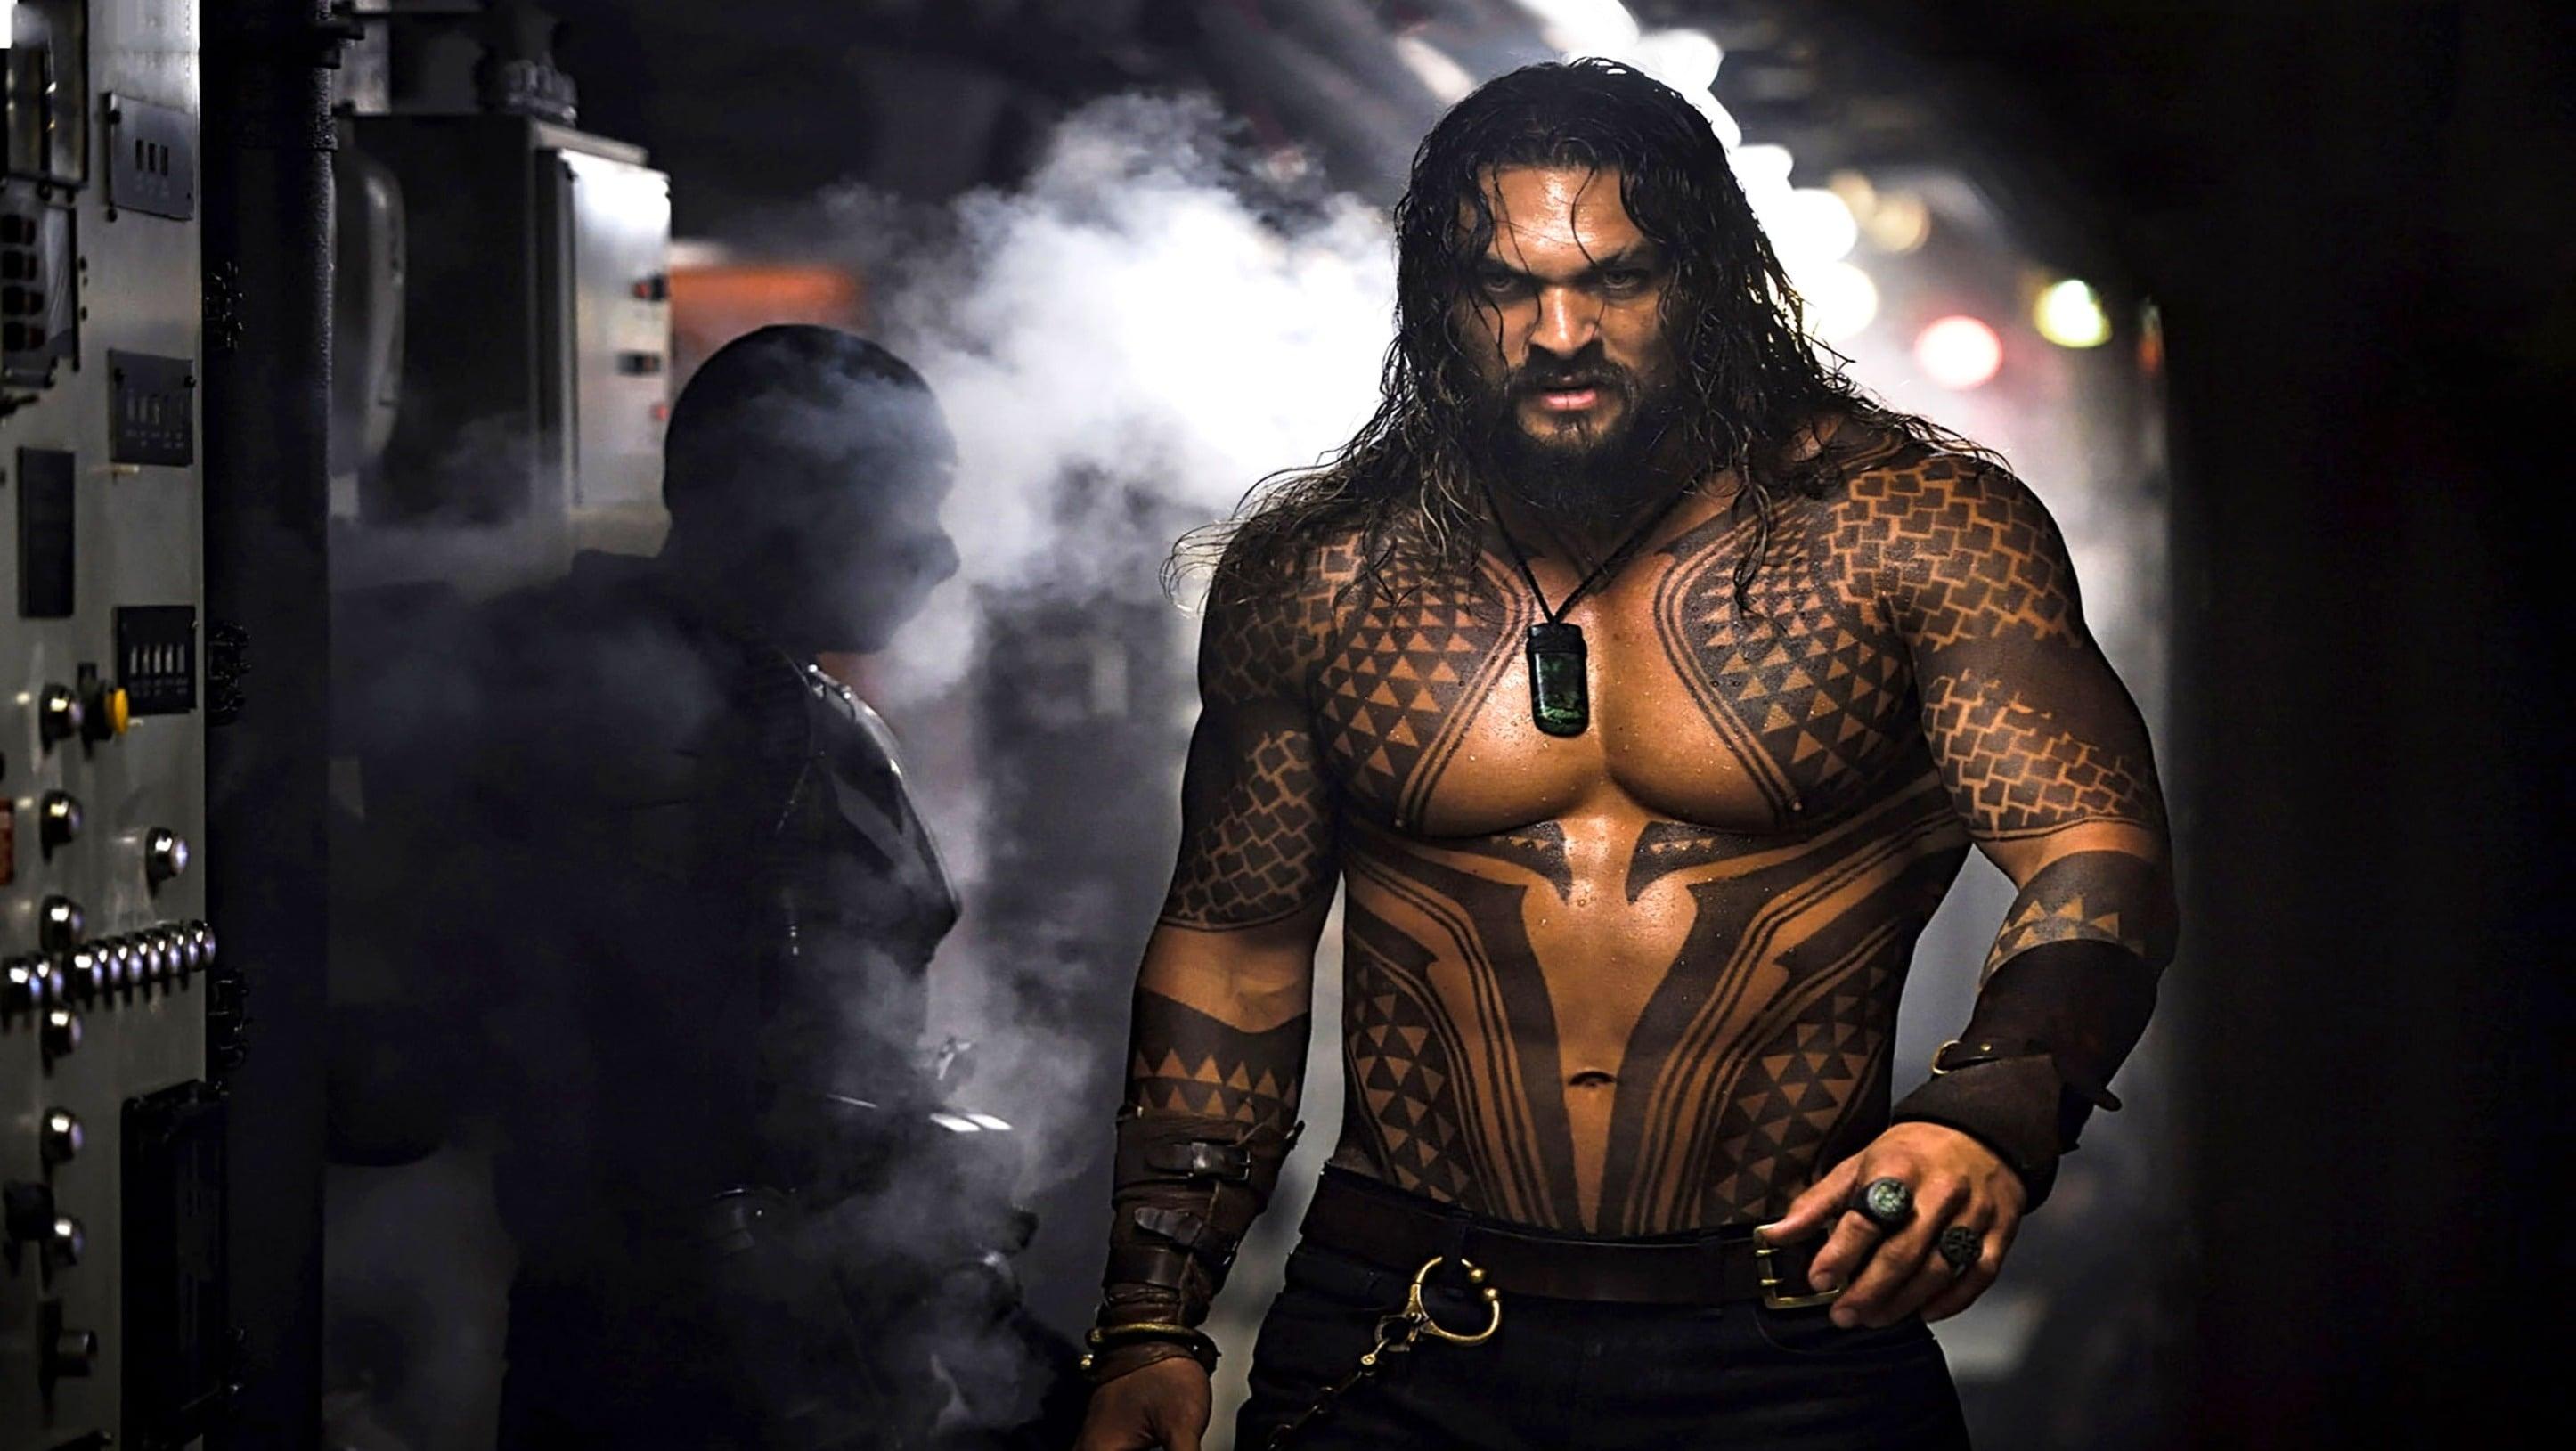 Aquaman 2018 dublado online filme online graacutetis hd 720p - 3 1